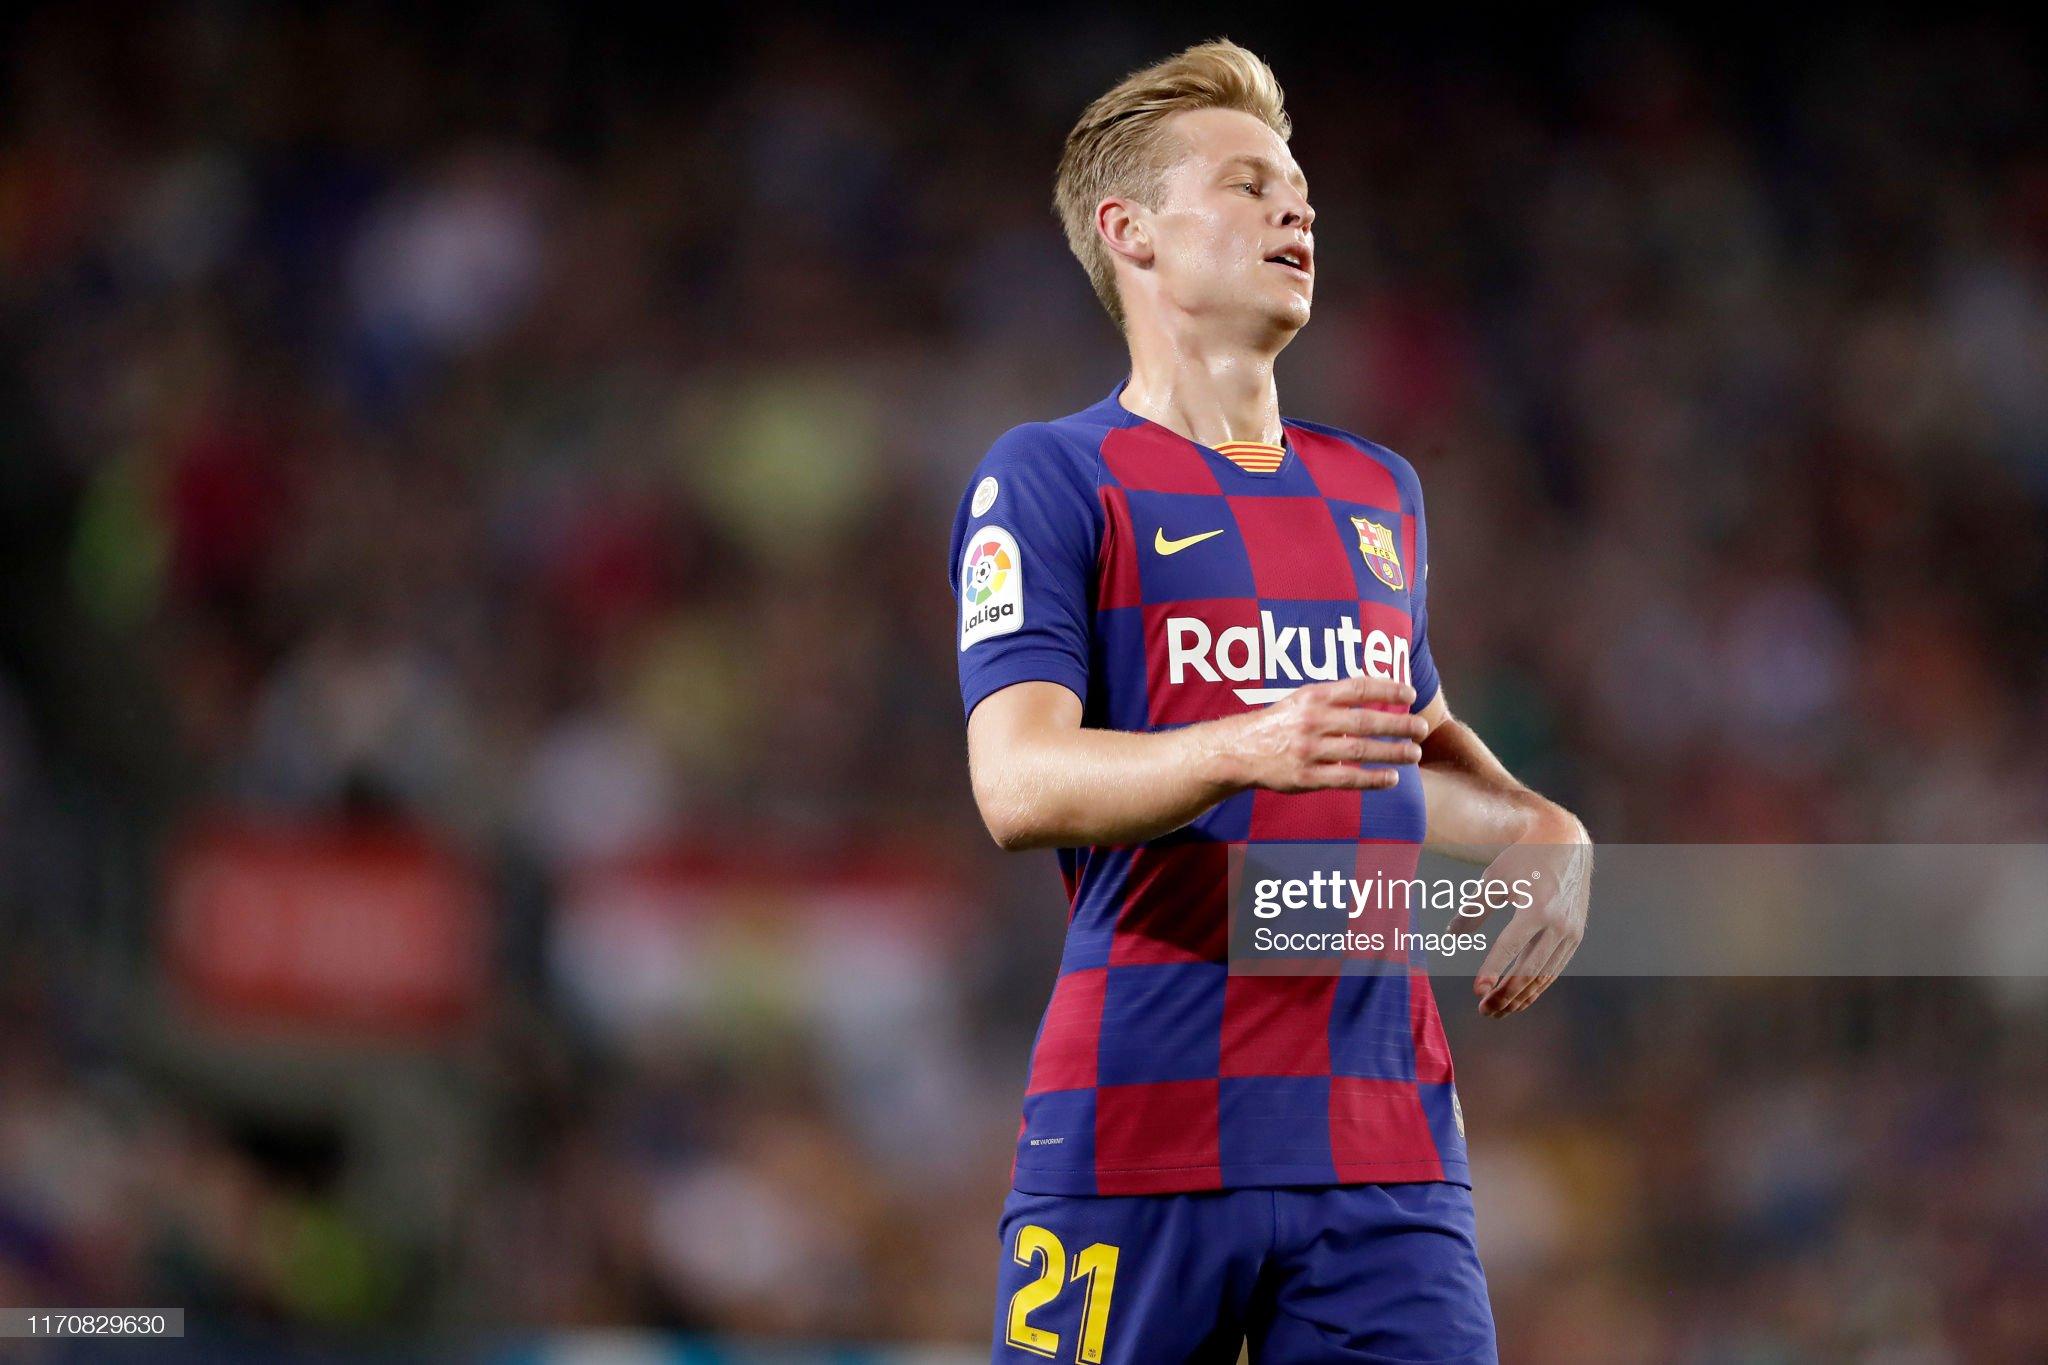 صور مباراة : برشلونة - فياريال 2-1 ( 24-09-2019 )  Frenkie-de-jong-of-fc-barcelona-during-the-la-liga-santander-match-picture-id1170829630?s=2048x2048